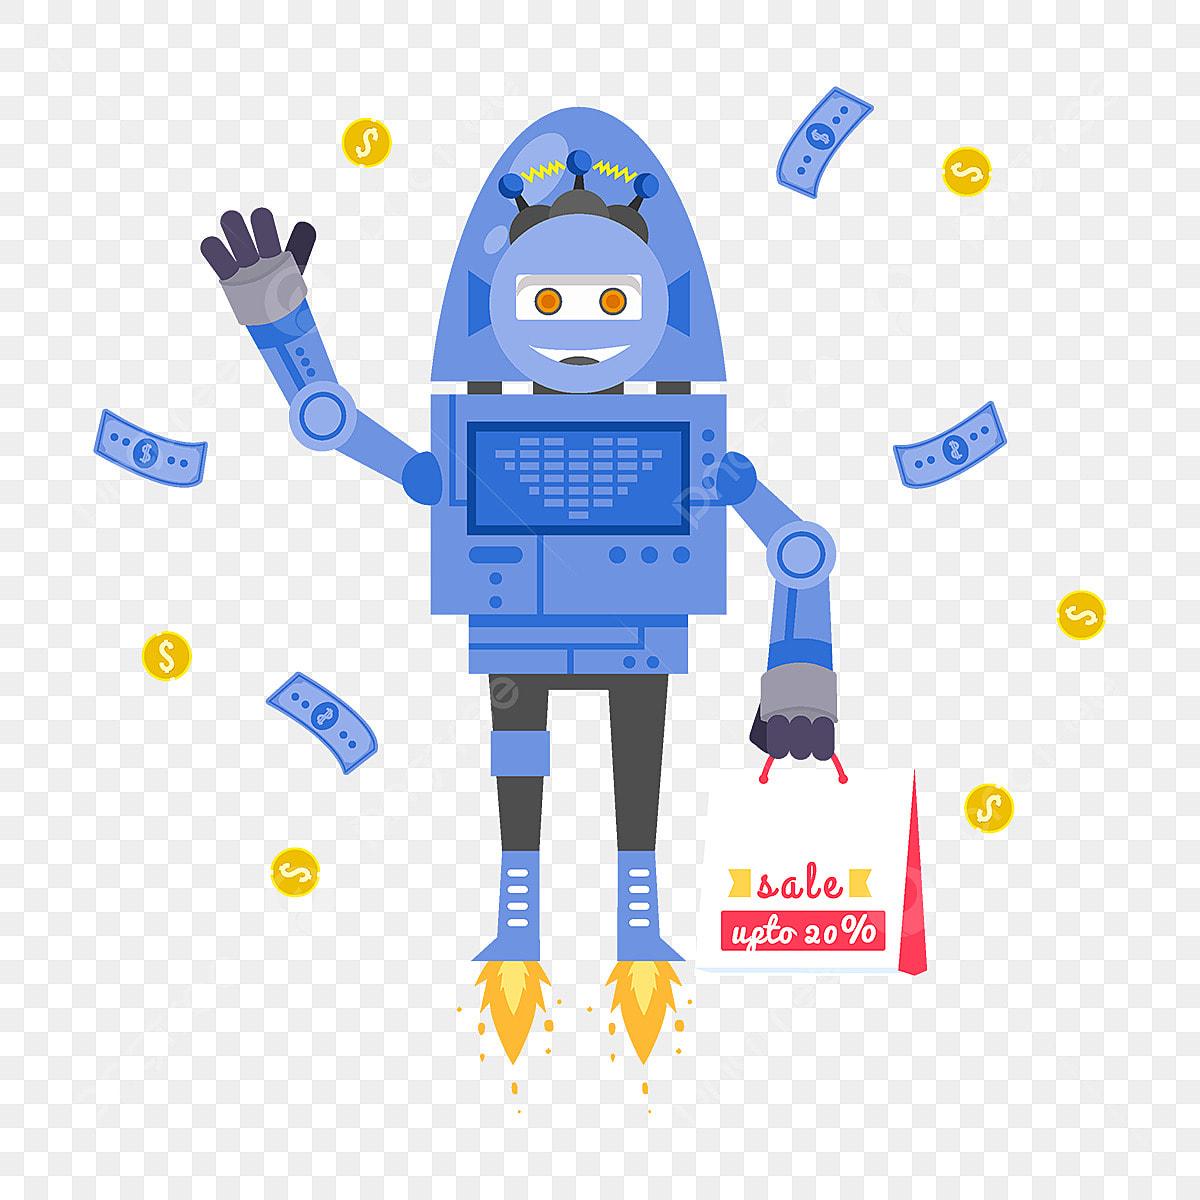 Cartoon Robot Shopping Illustration, Cartoon, Cute, Hand